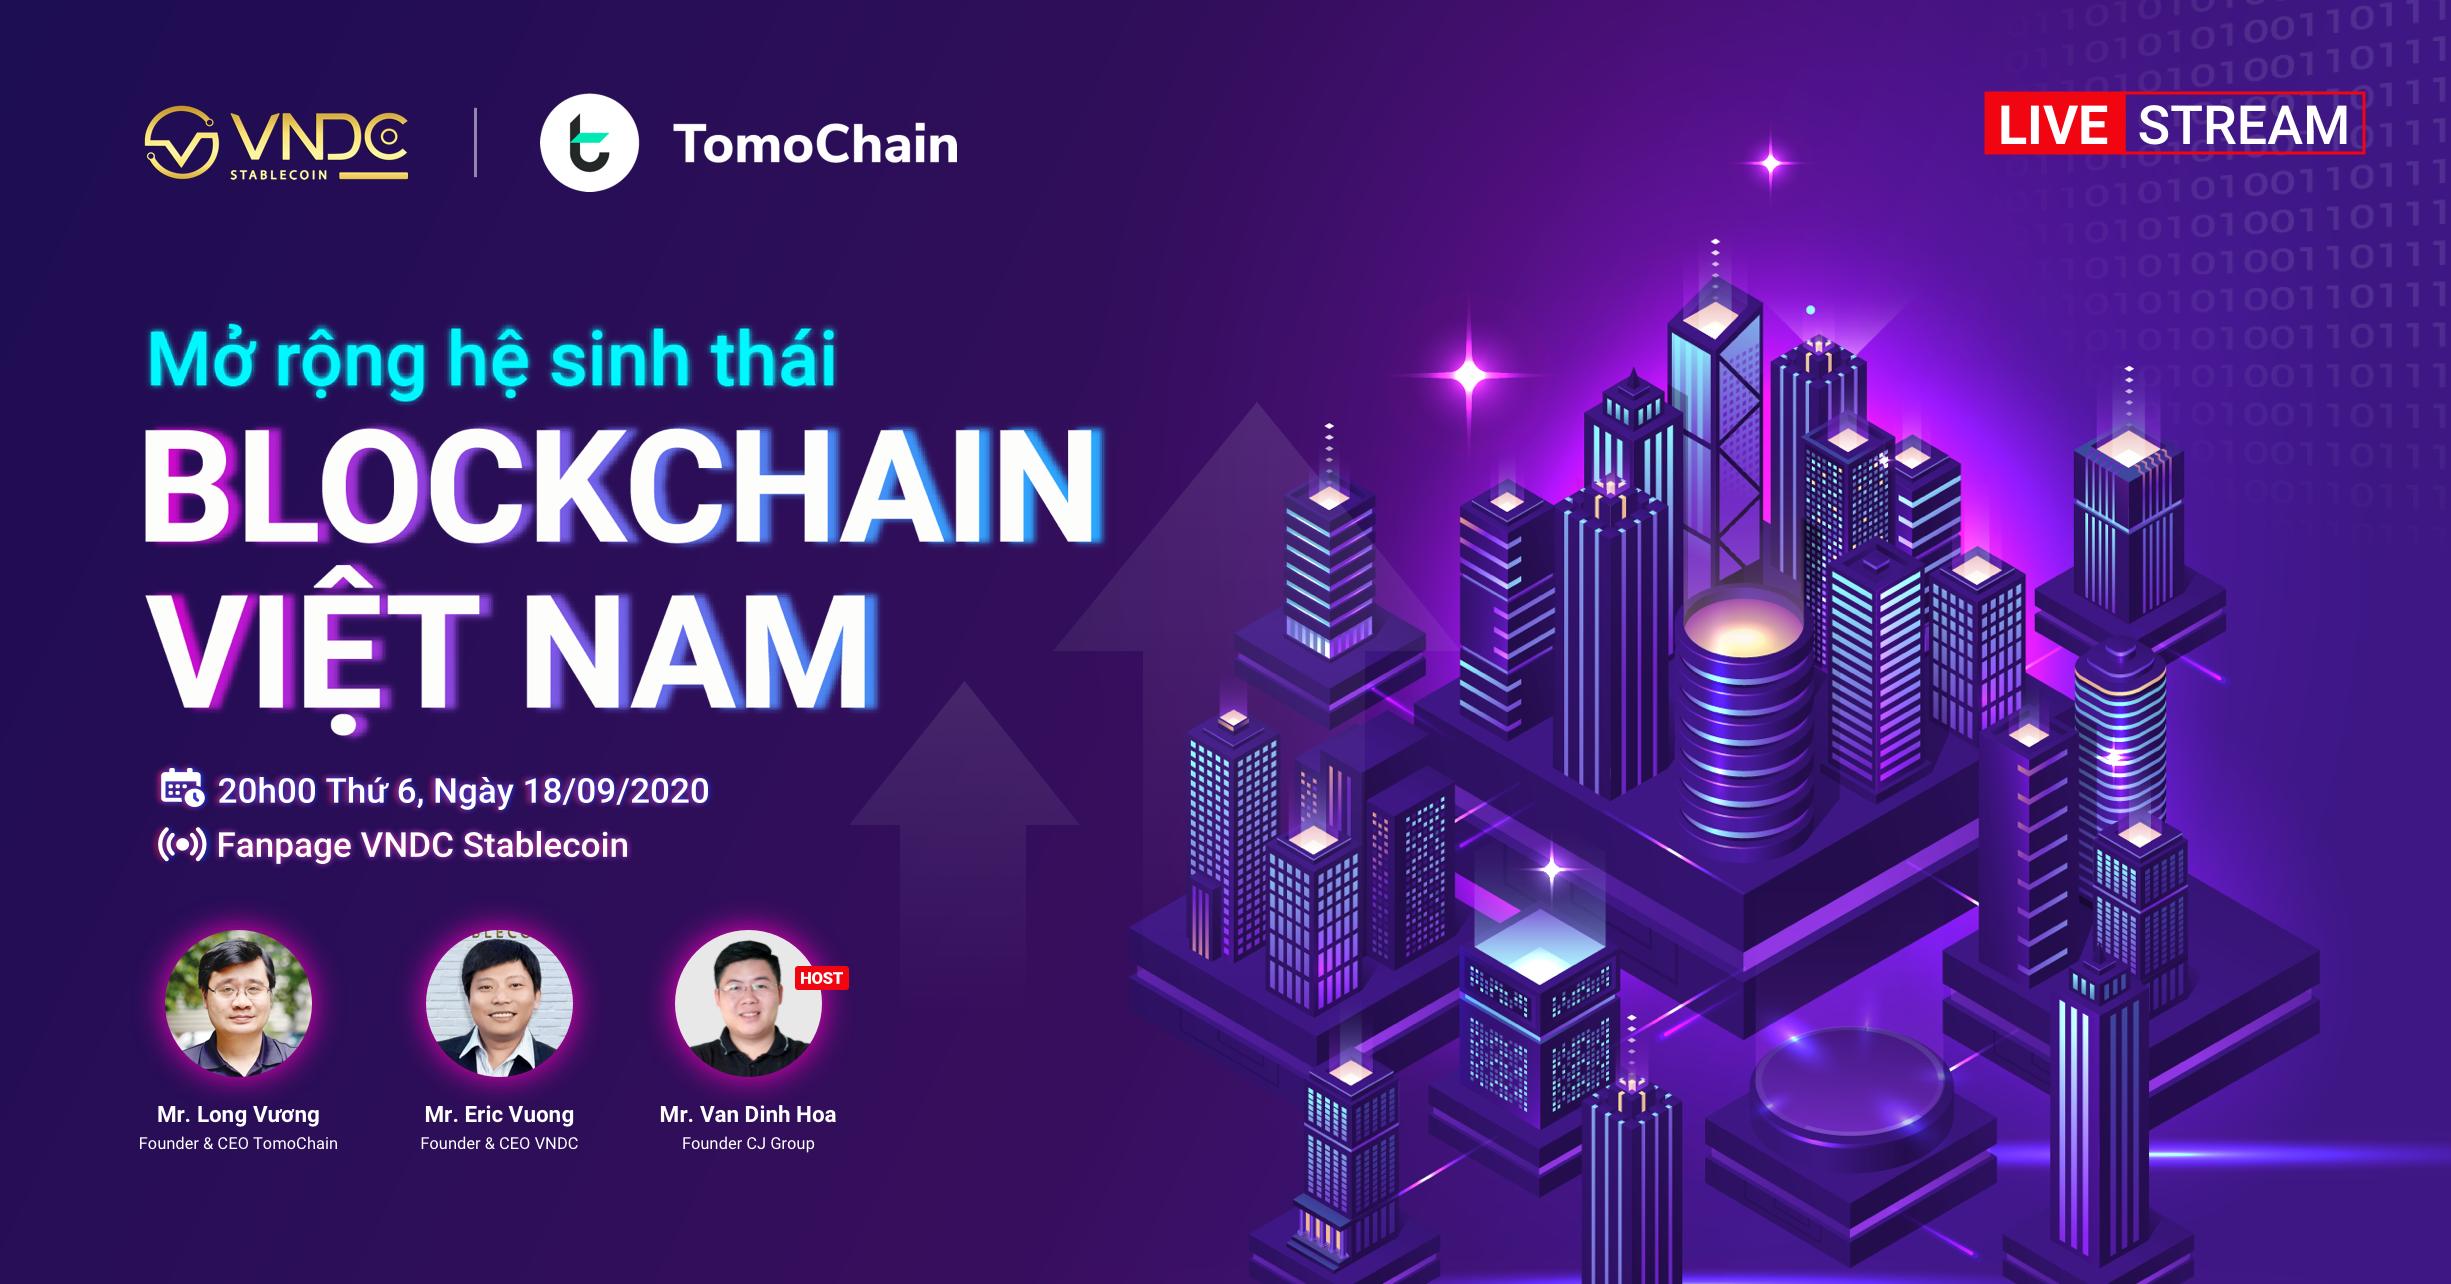 Livestream VNDC X TOMO: Expanding Blockchain ecosystem in Vietnam